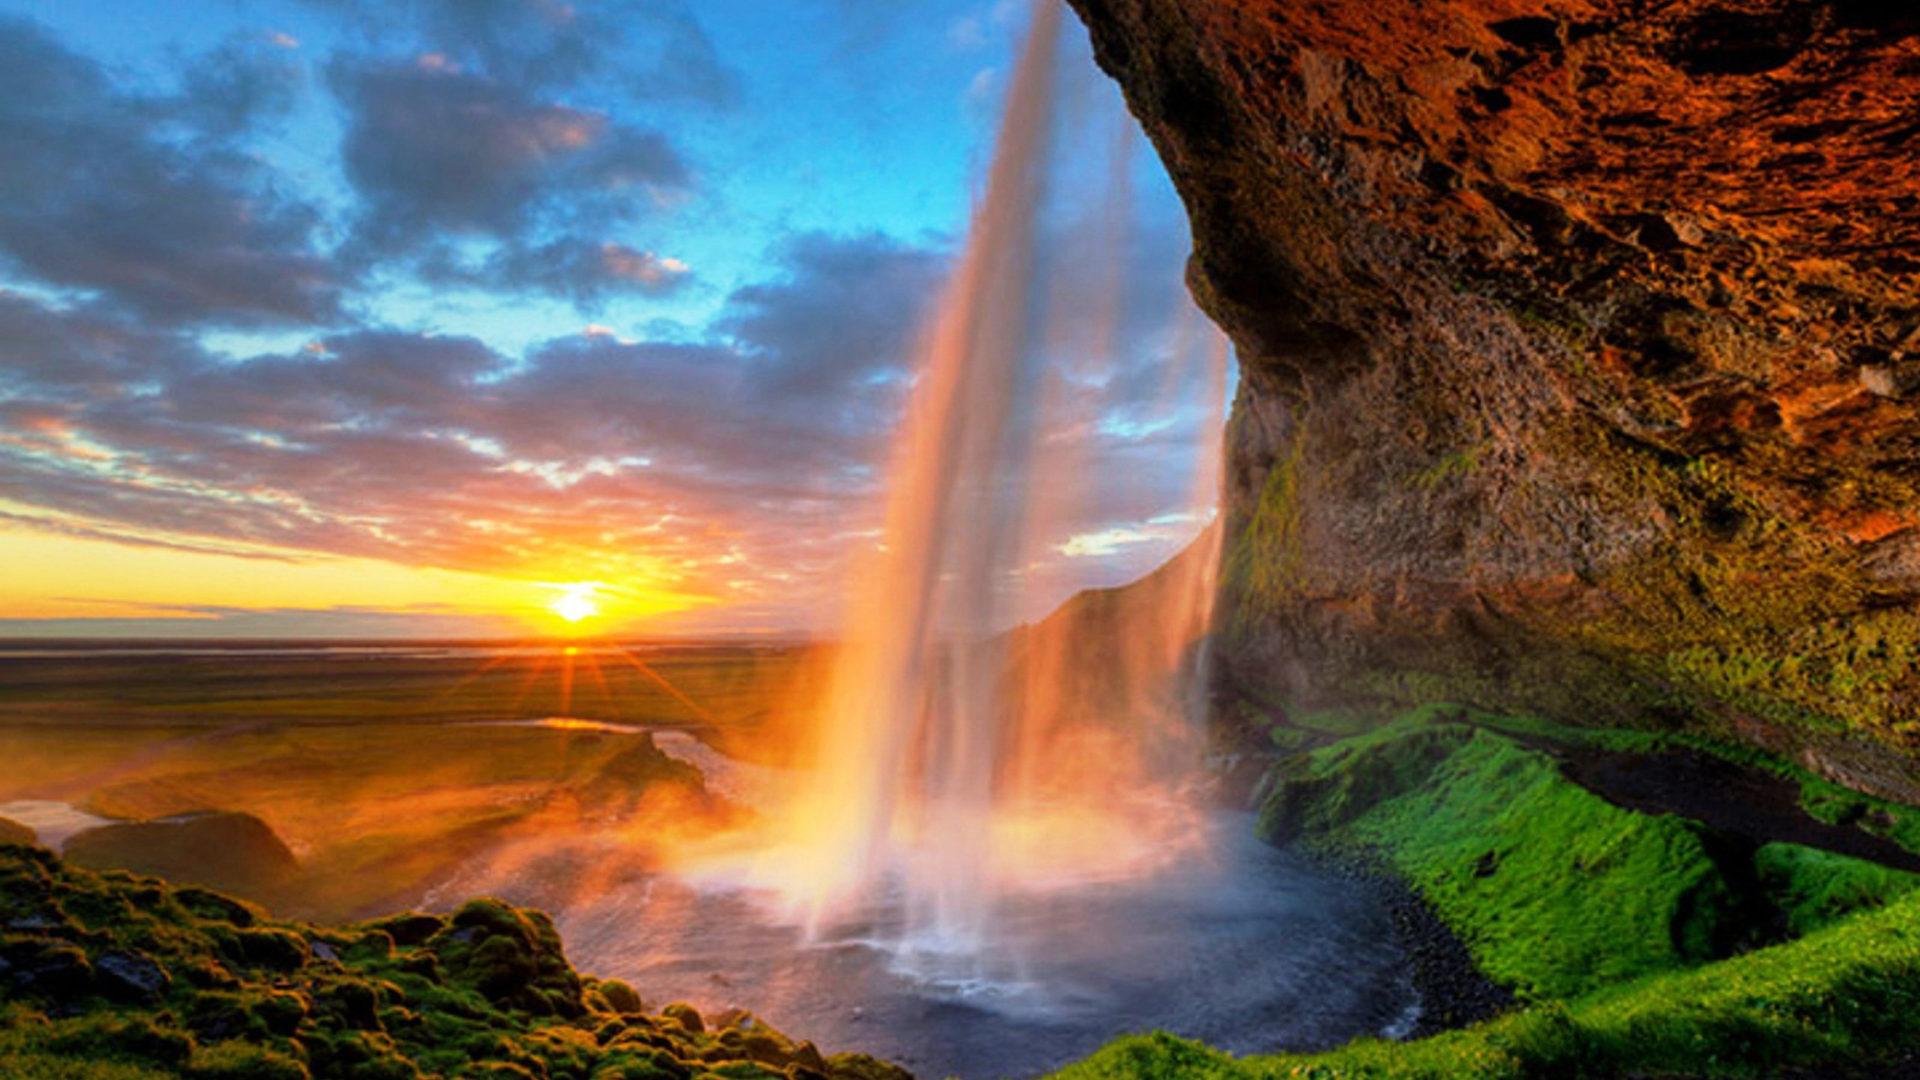 Angel Falls Wallpaper Seljalandsfoss Is One Of The Most Famous Waterfalls In